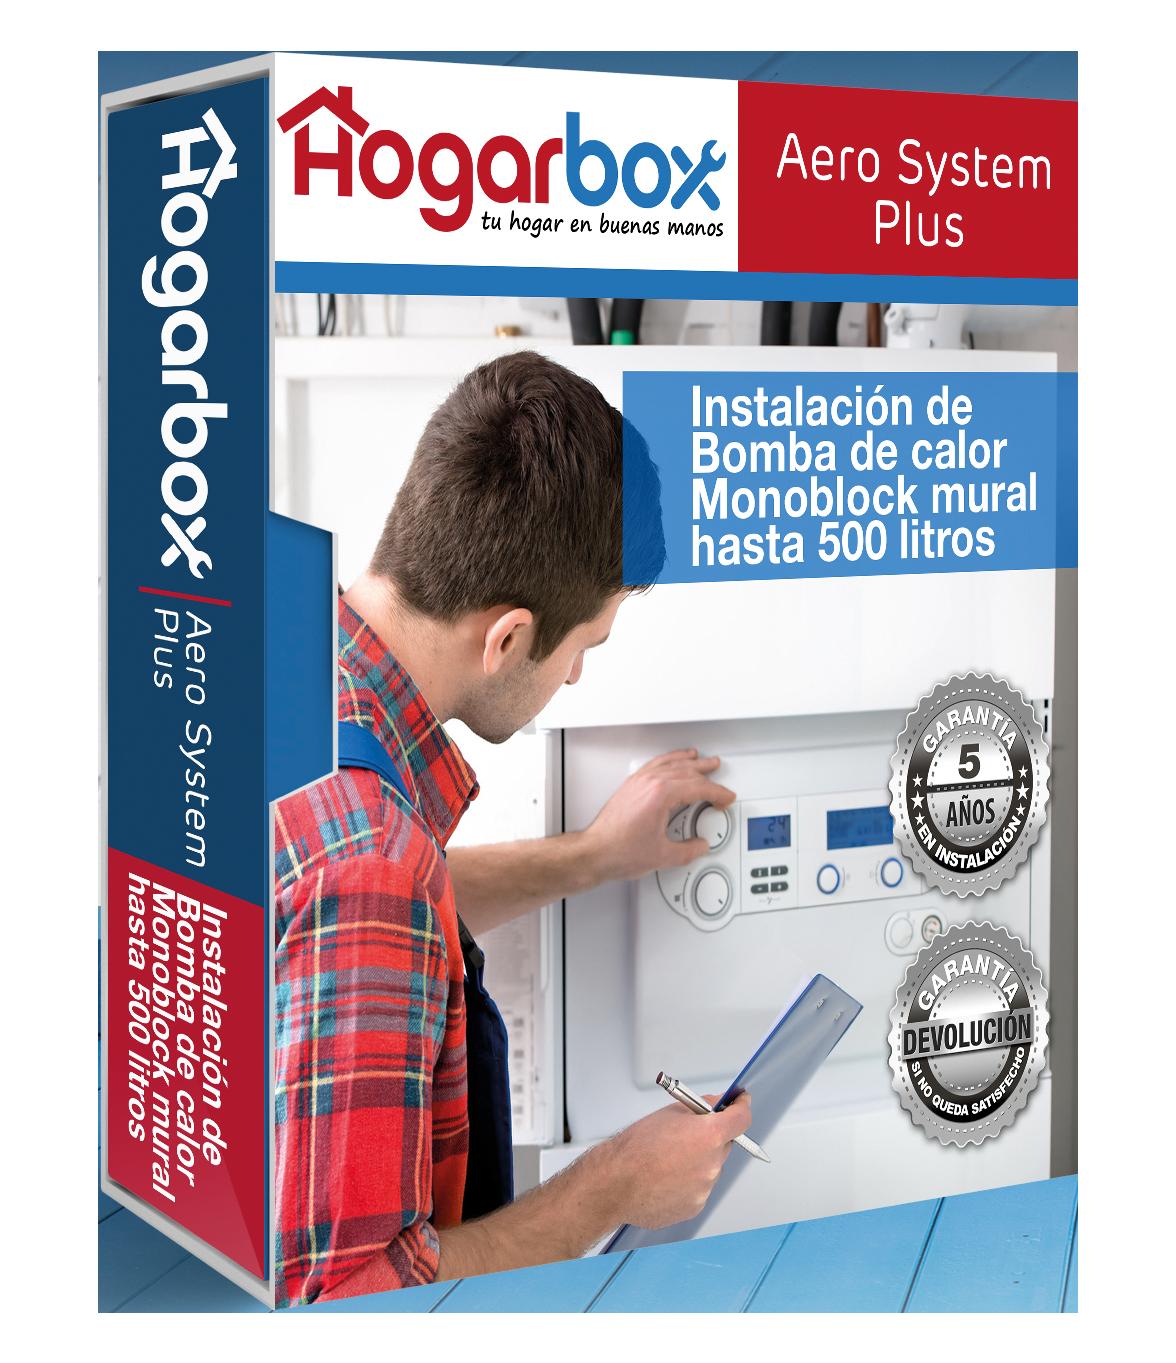 Hogarbox aero system plus instalaci n bomba de calor con acs for Instalacion de bomba de calor para piscinas